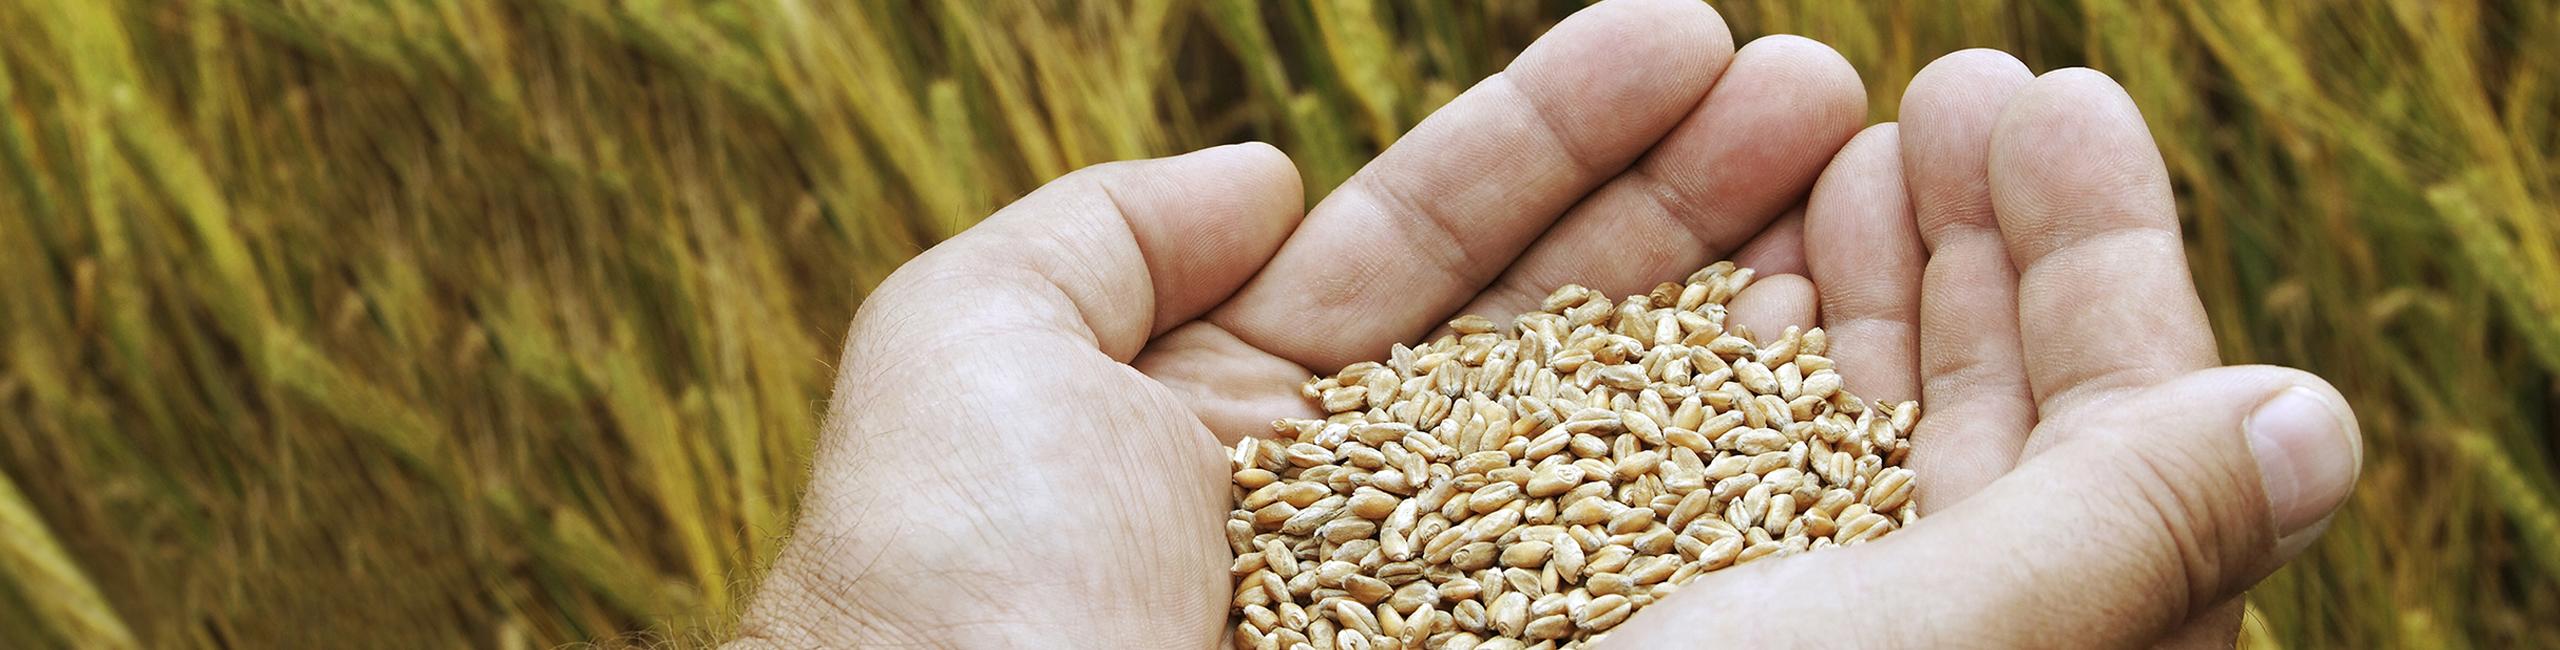 Illumina Announces the Thirteenth Agricultural Greater Good Grant Winner